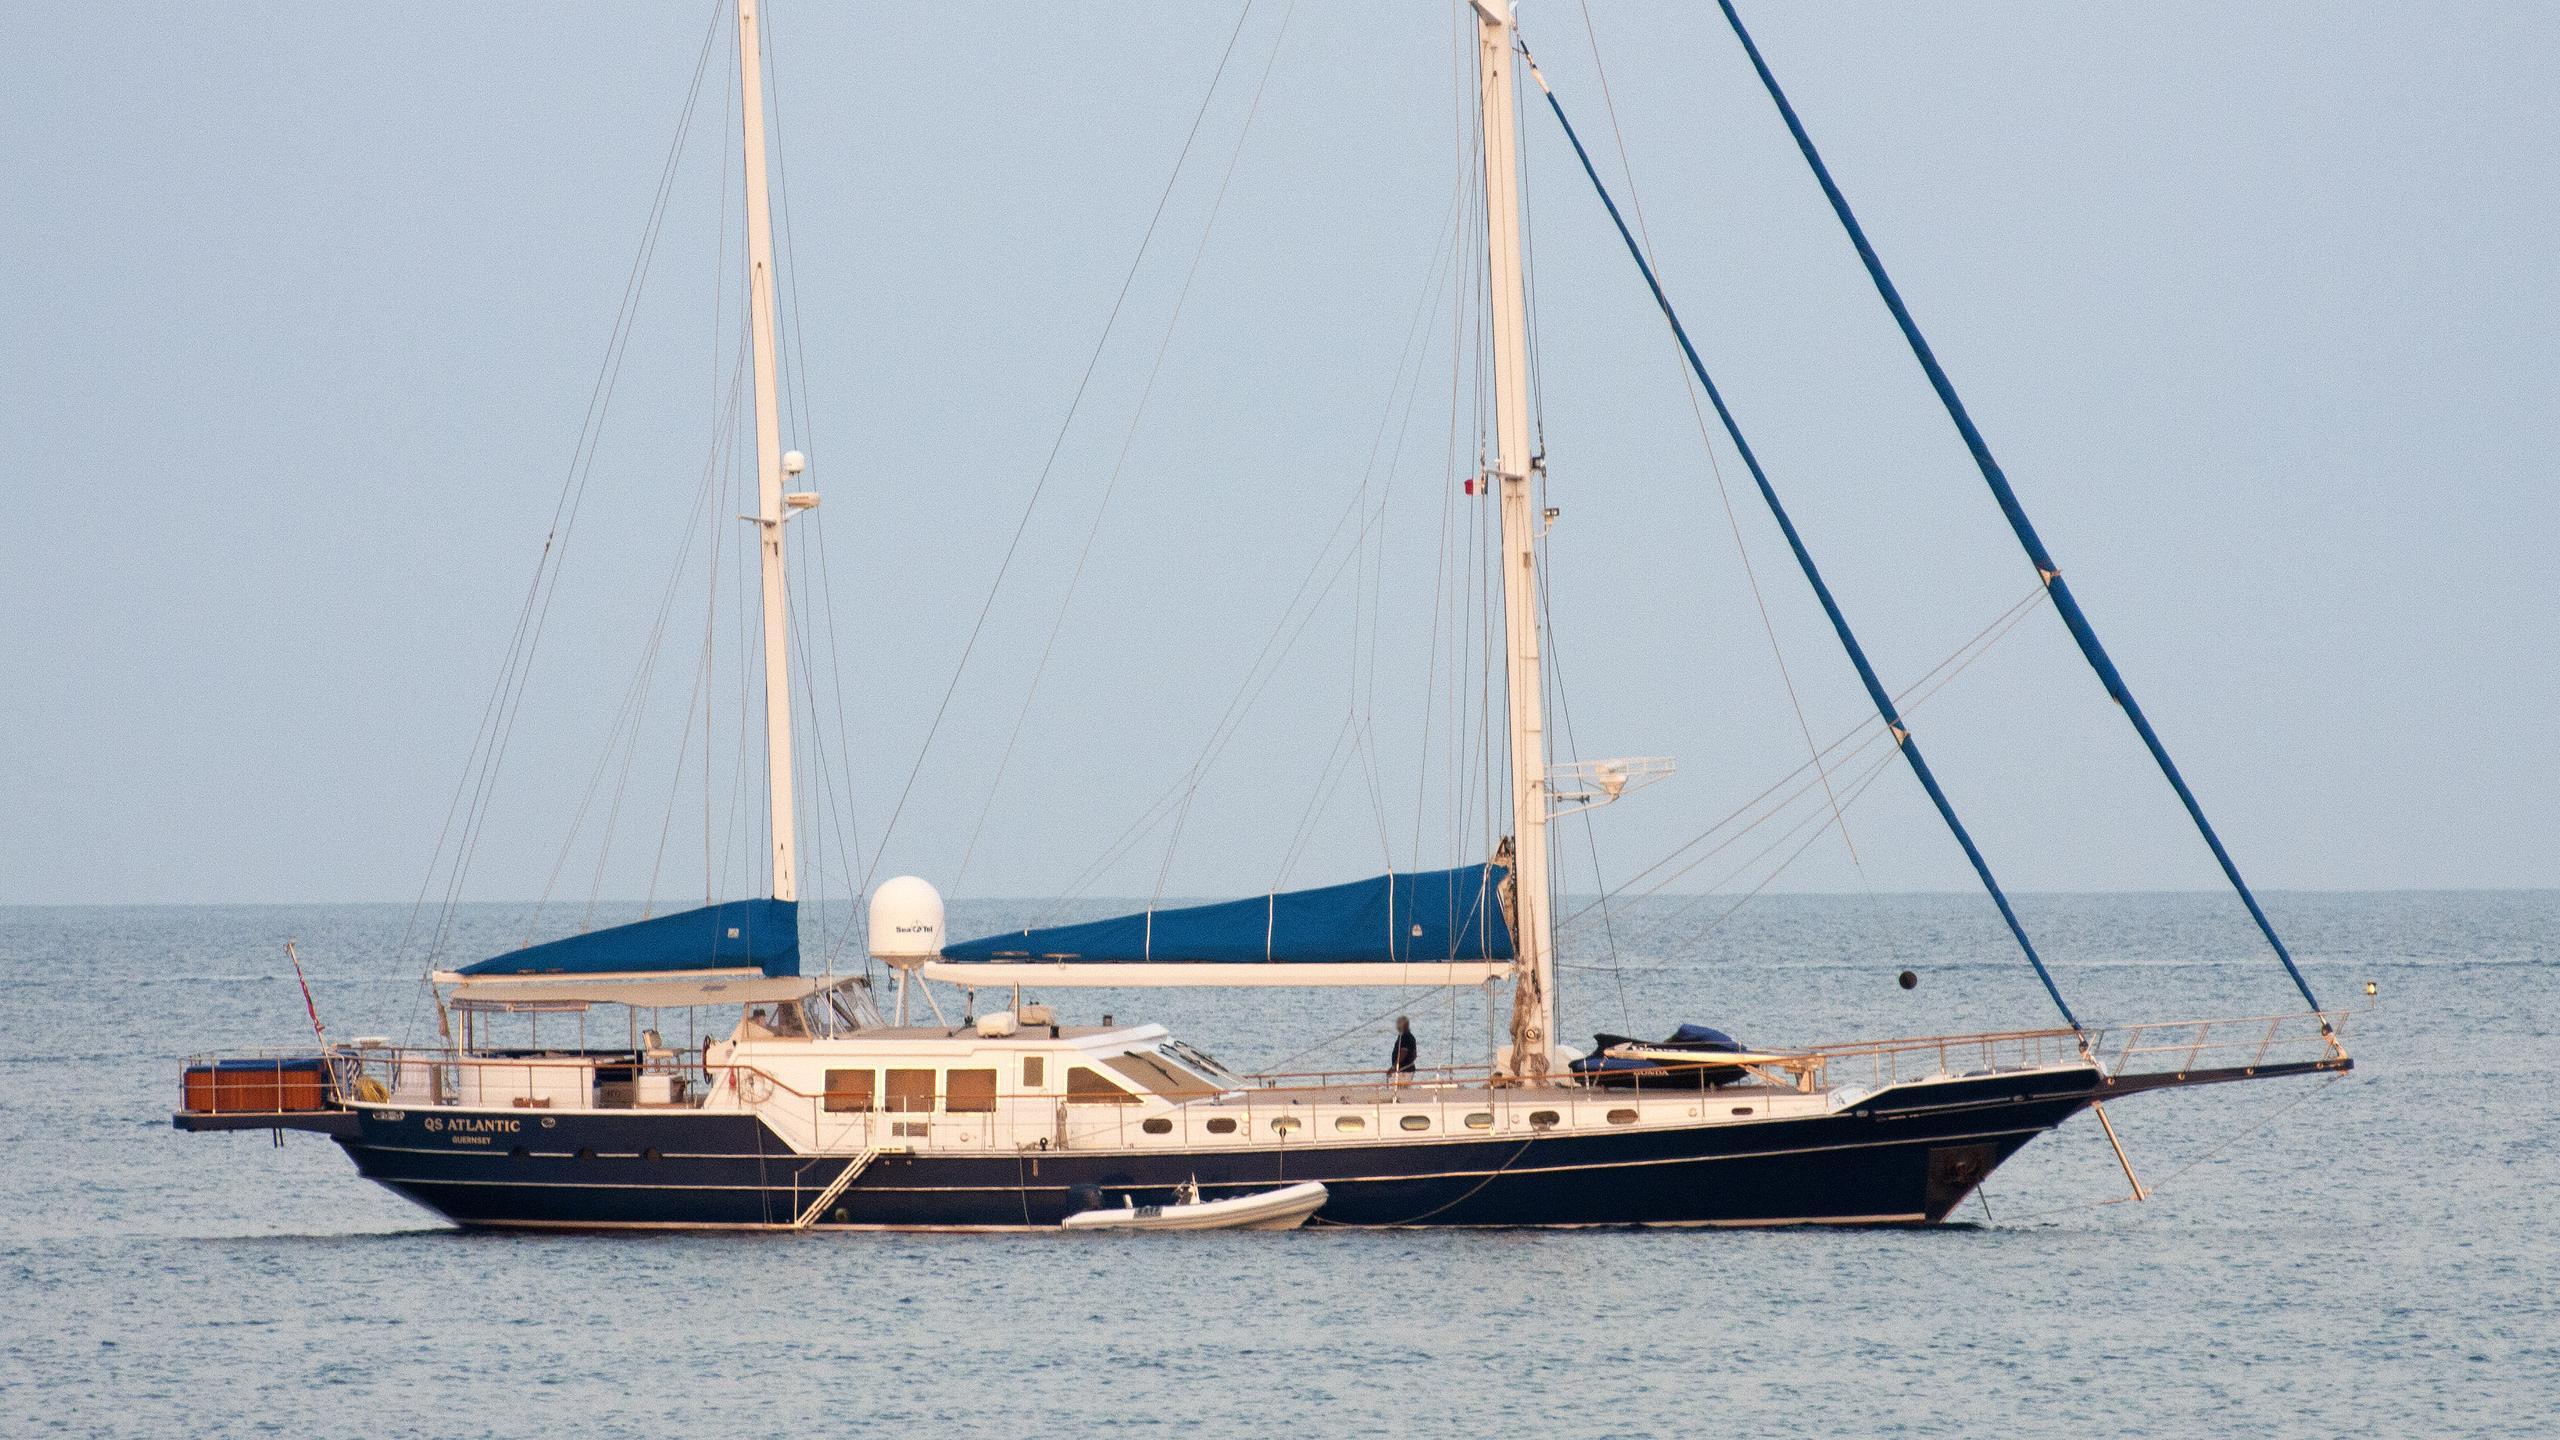 queen-south-iii-sailing-yacht-cihan-marine-1997-36m-profile